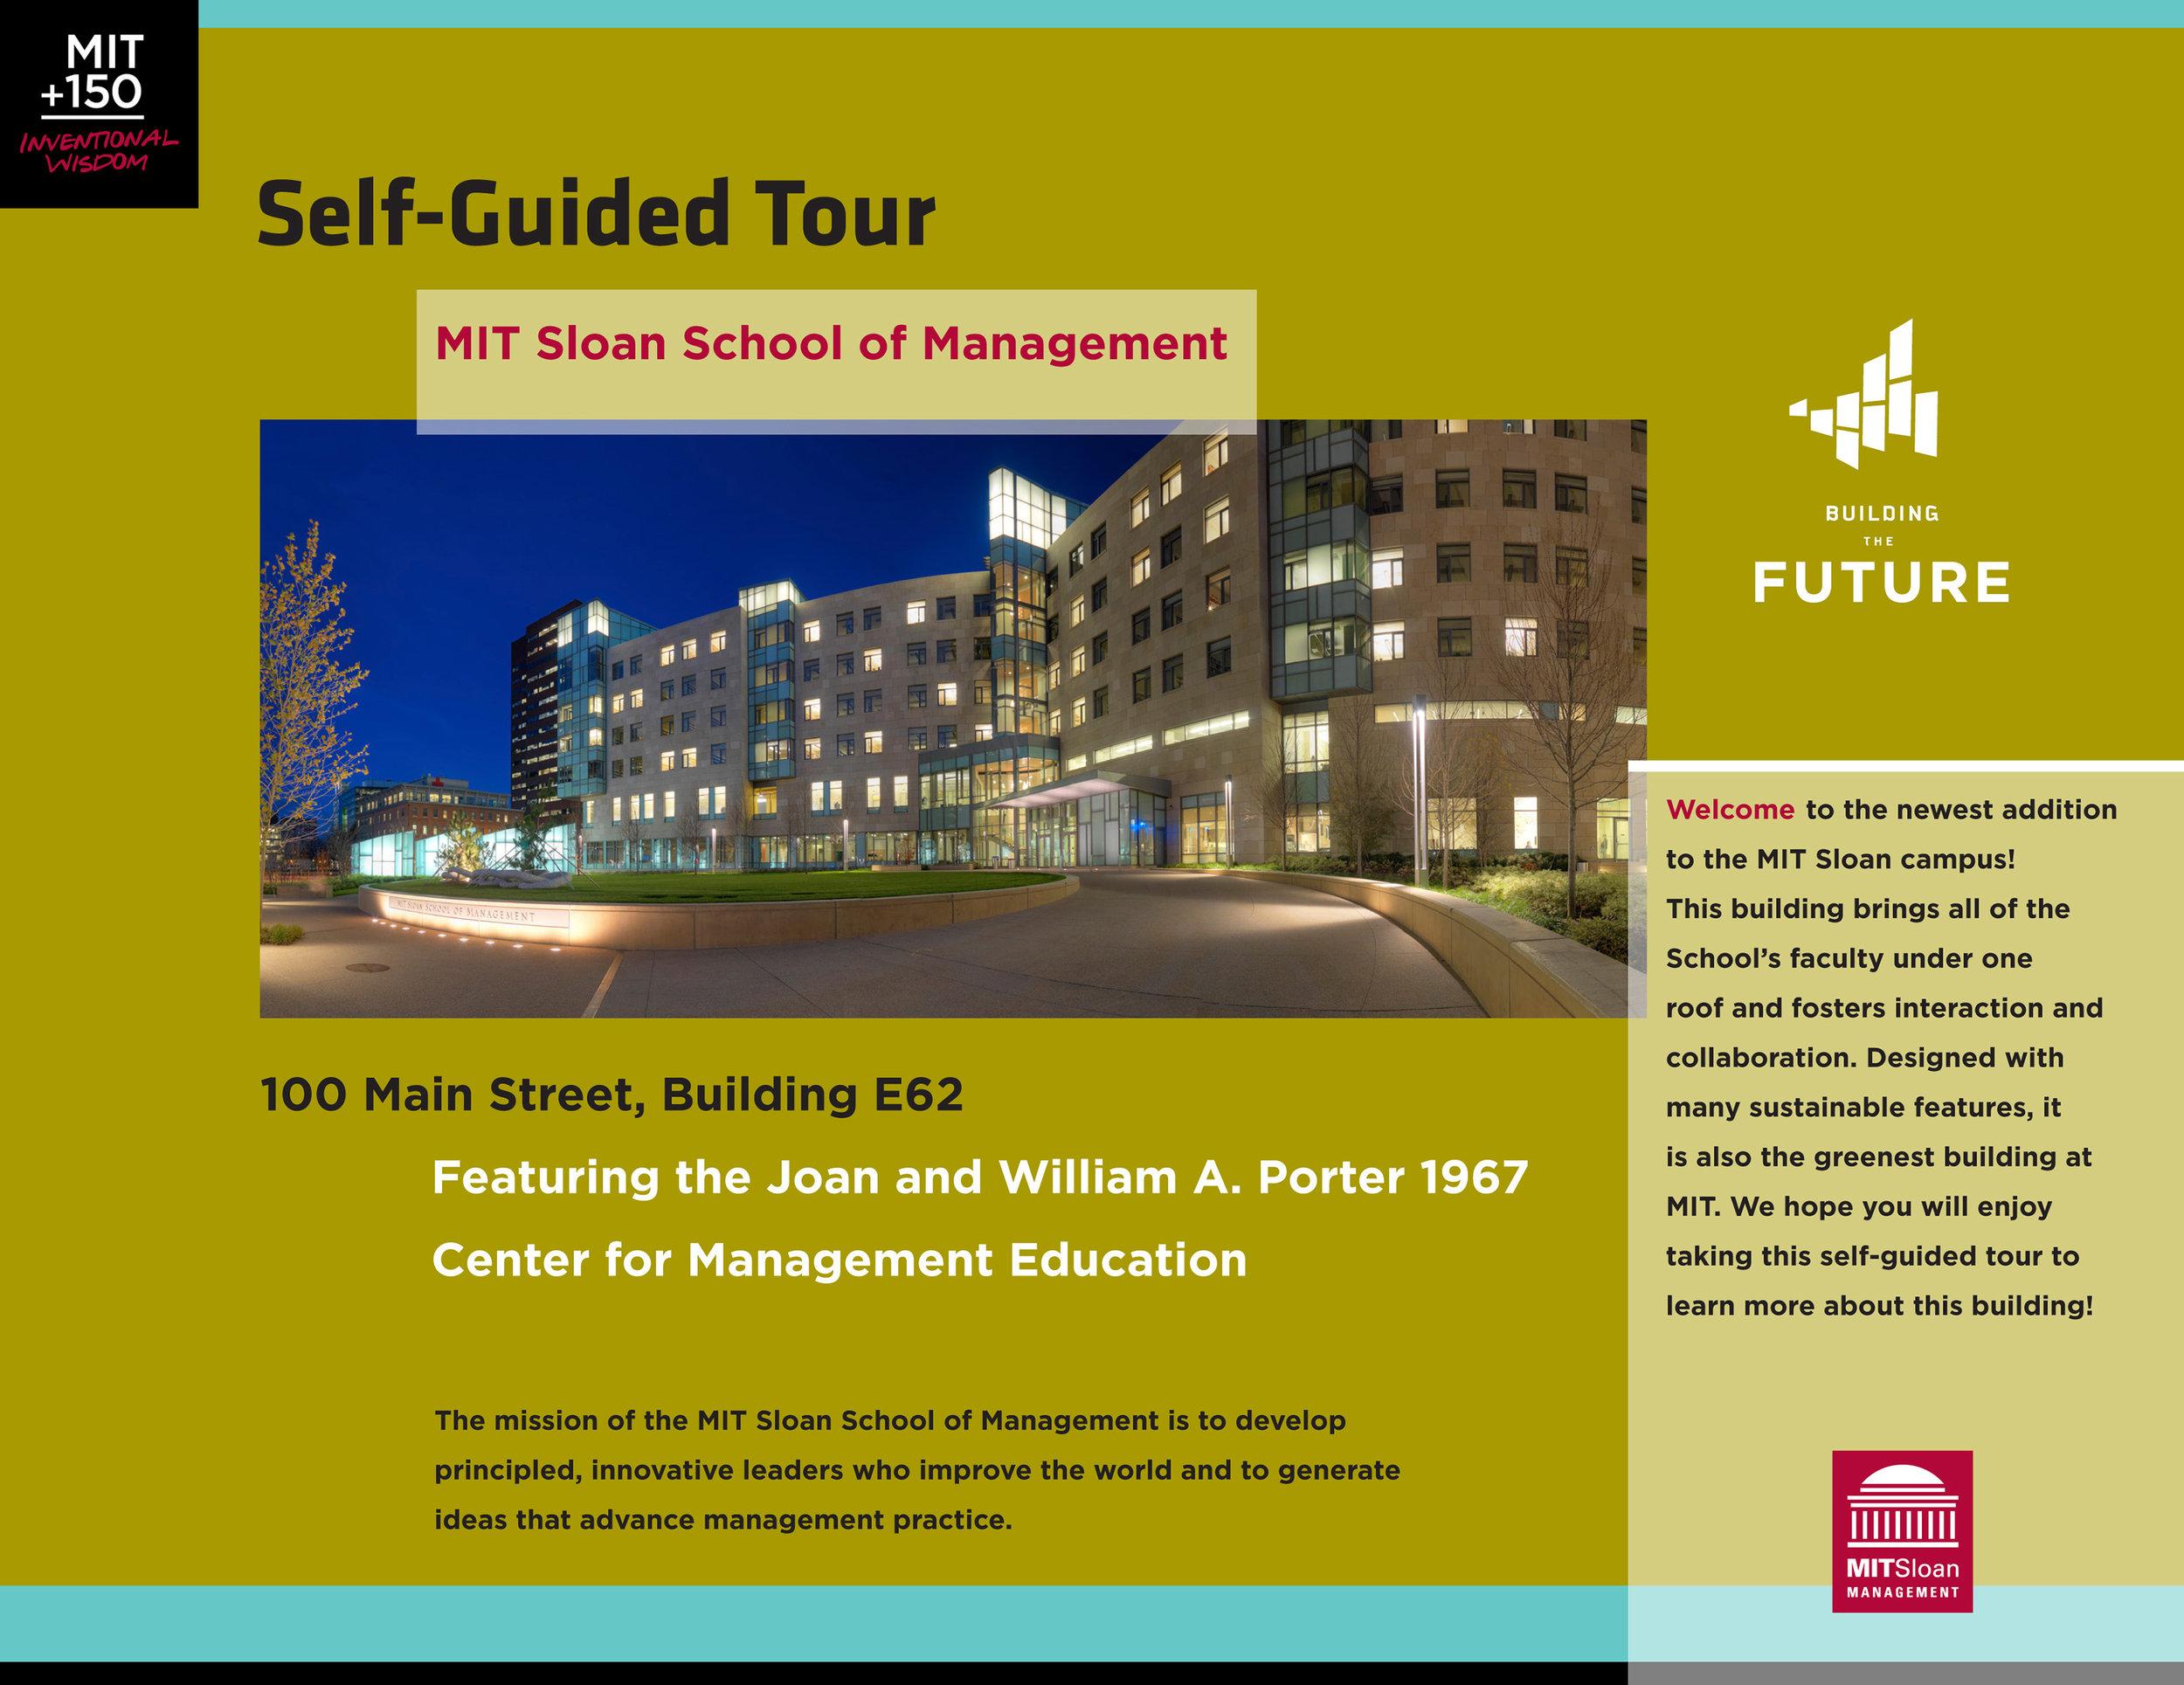 mitsloan-selfguide-tour-1-1lrgmed.jpg